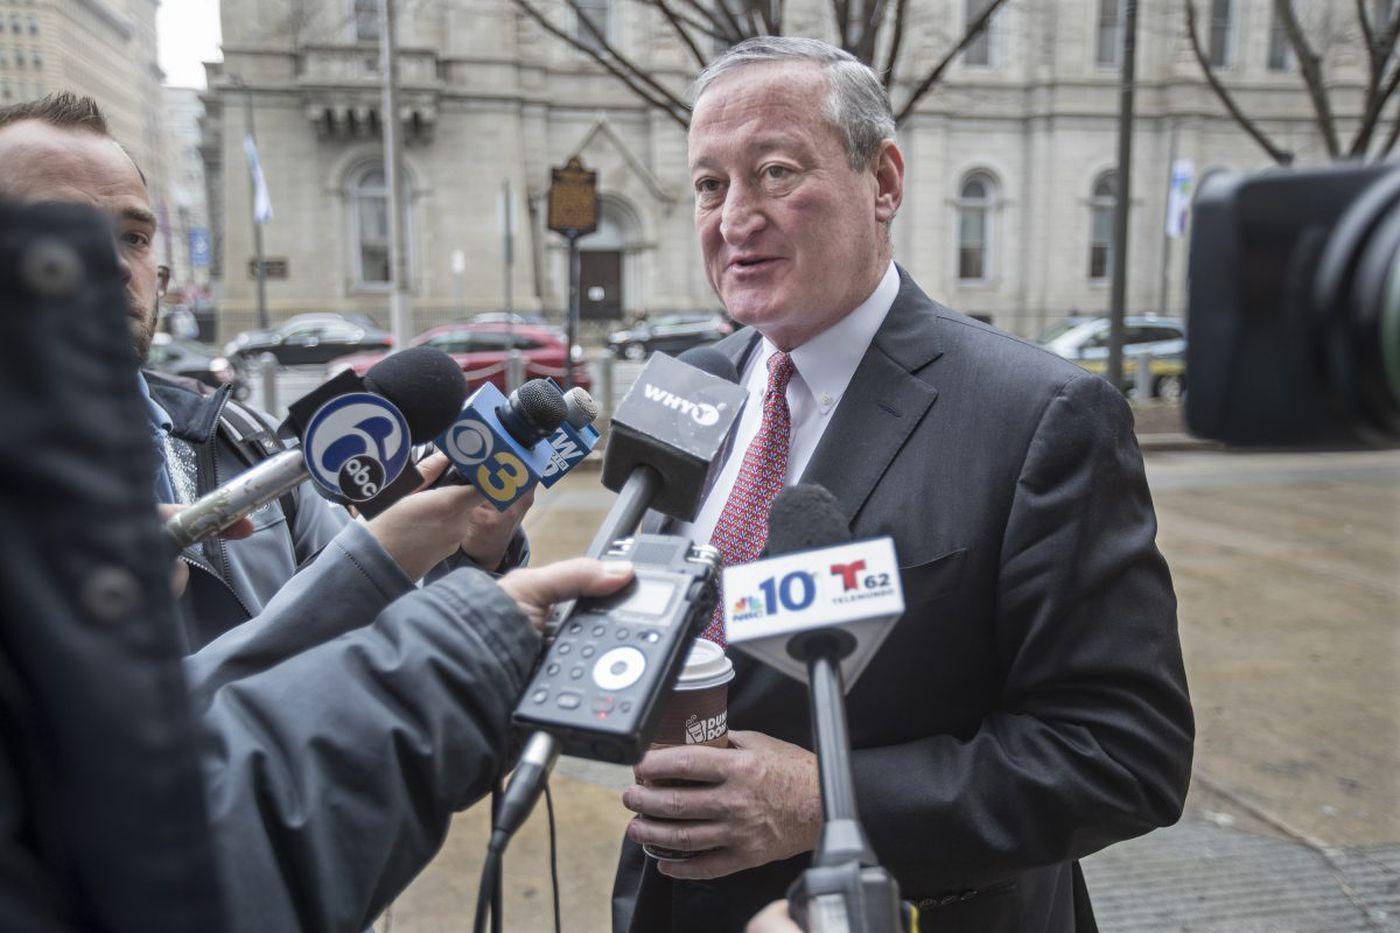 Philly: Soda tax revenue to fall short